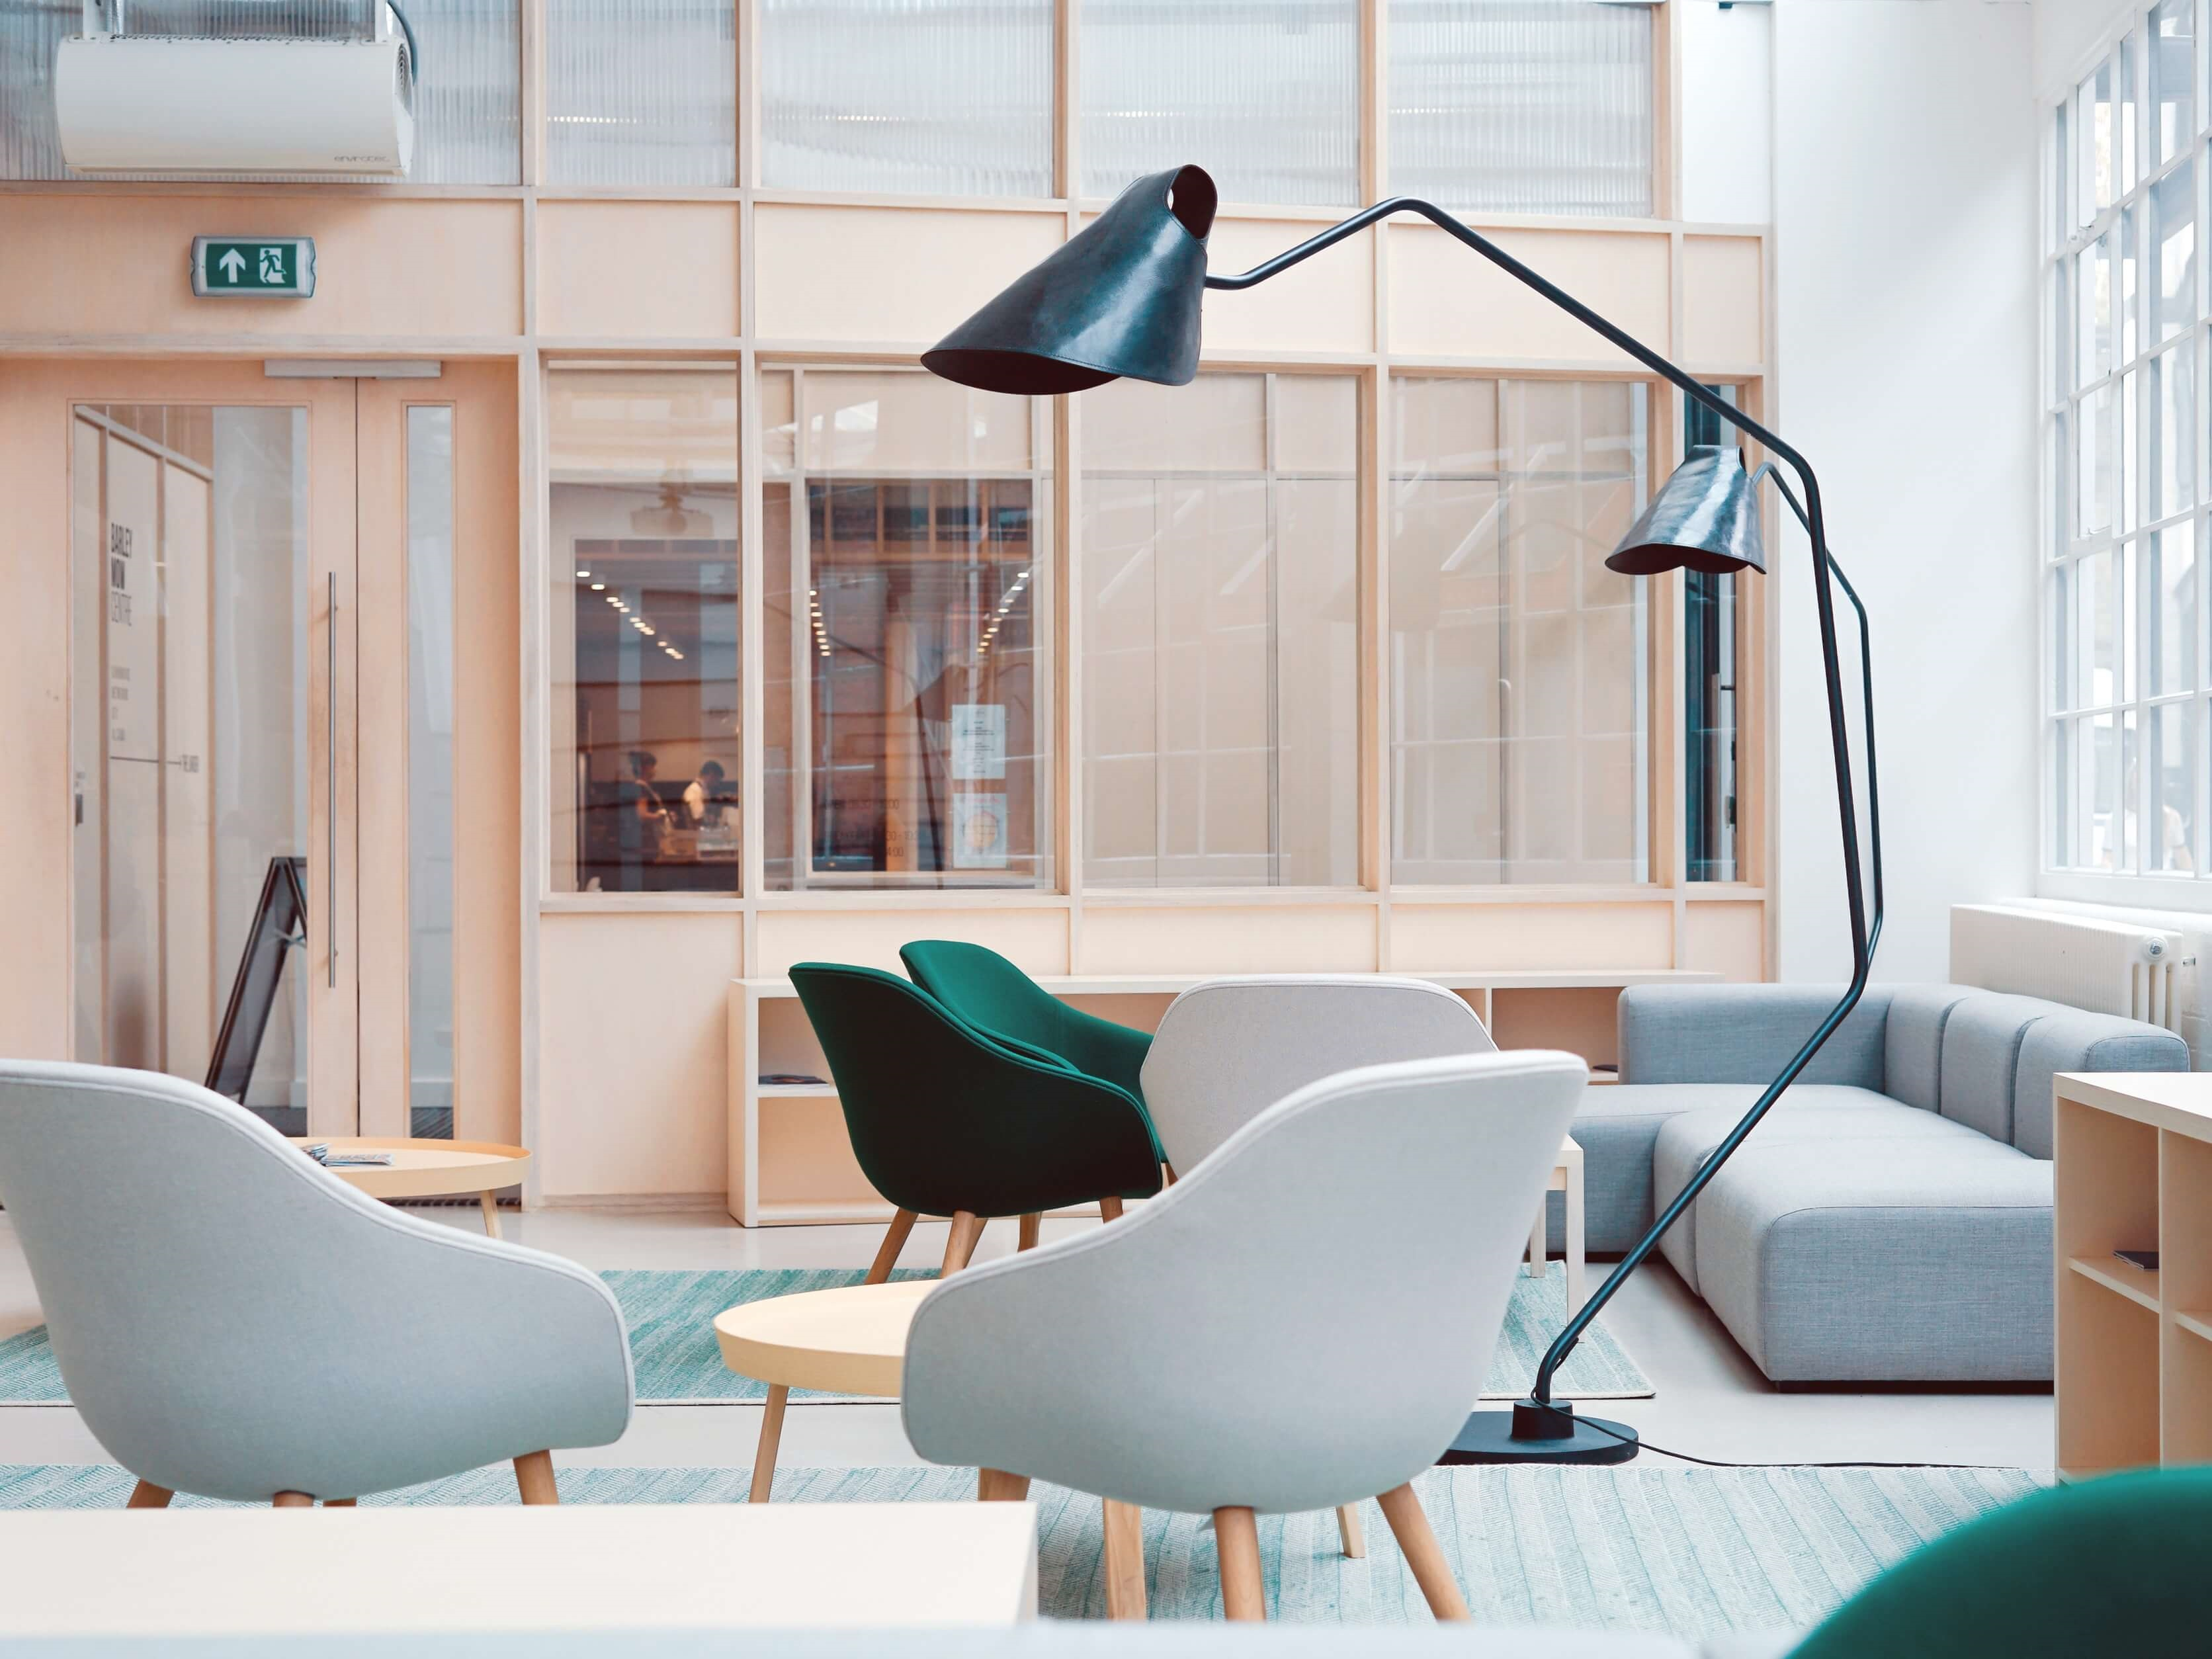 Interior Design. PHOTO: Toa Heftiba on Unsplash